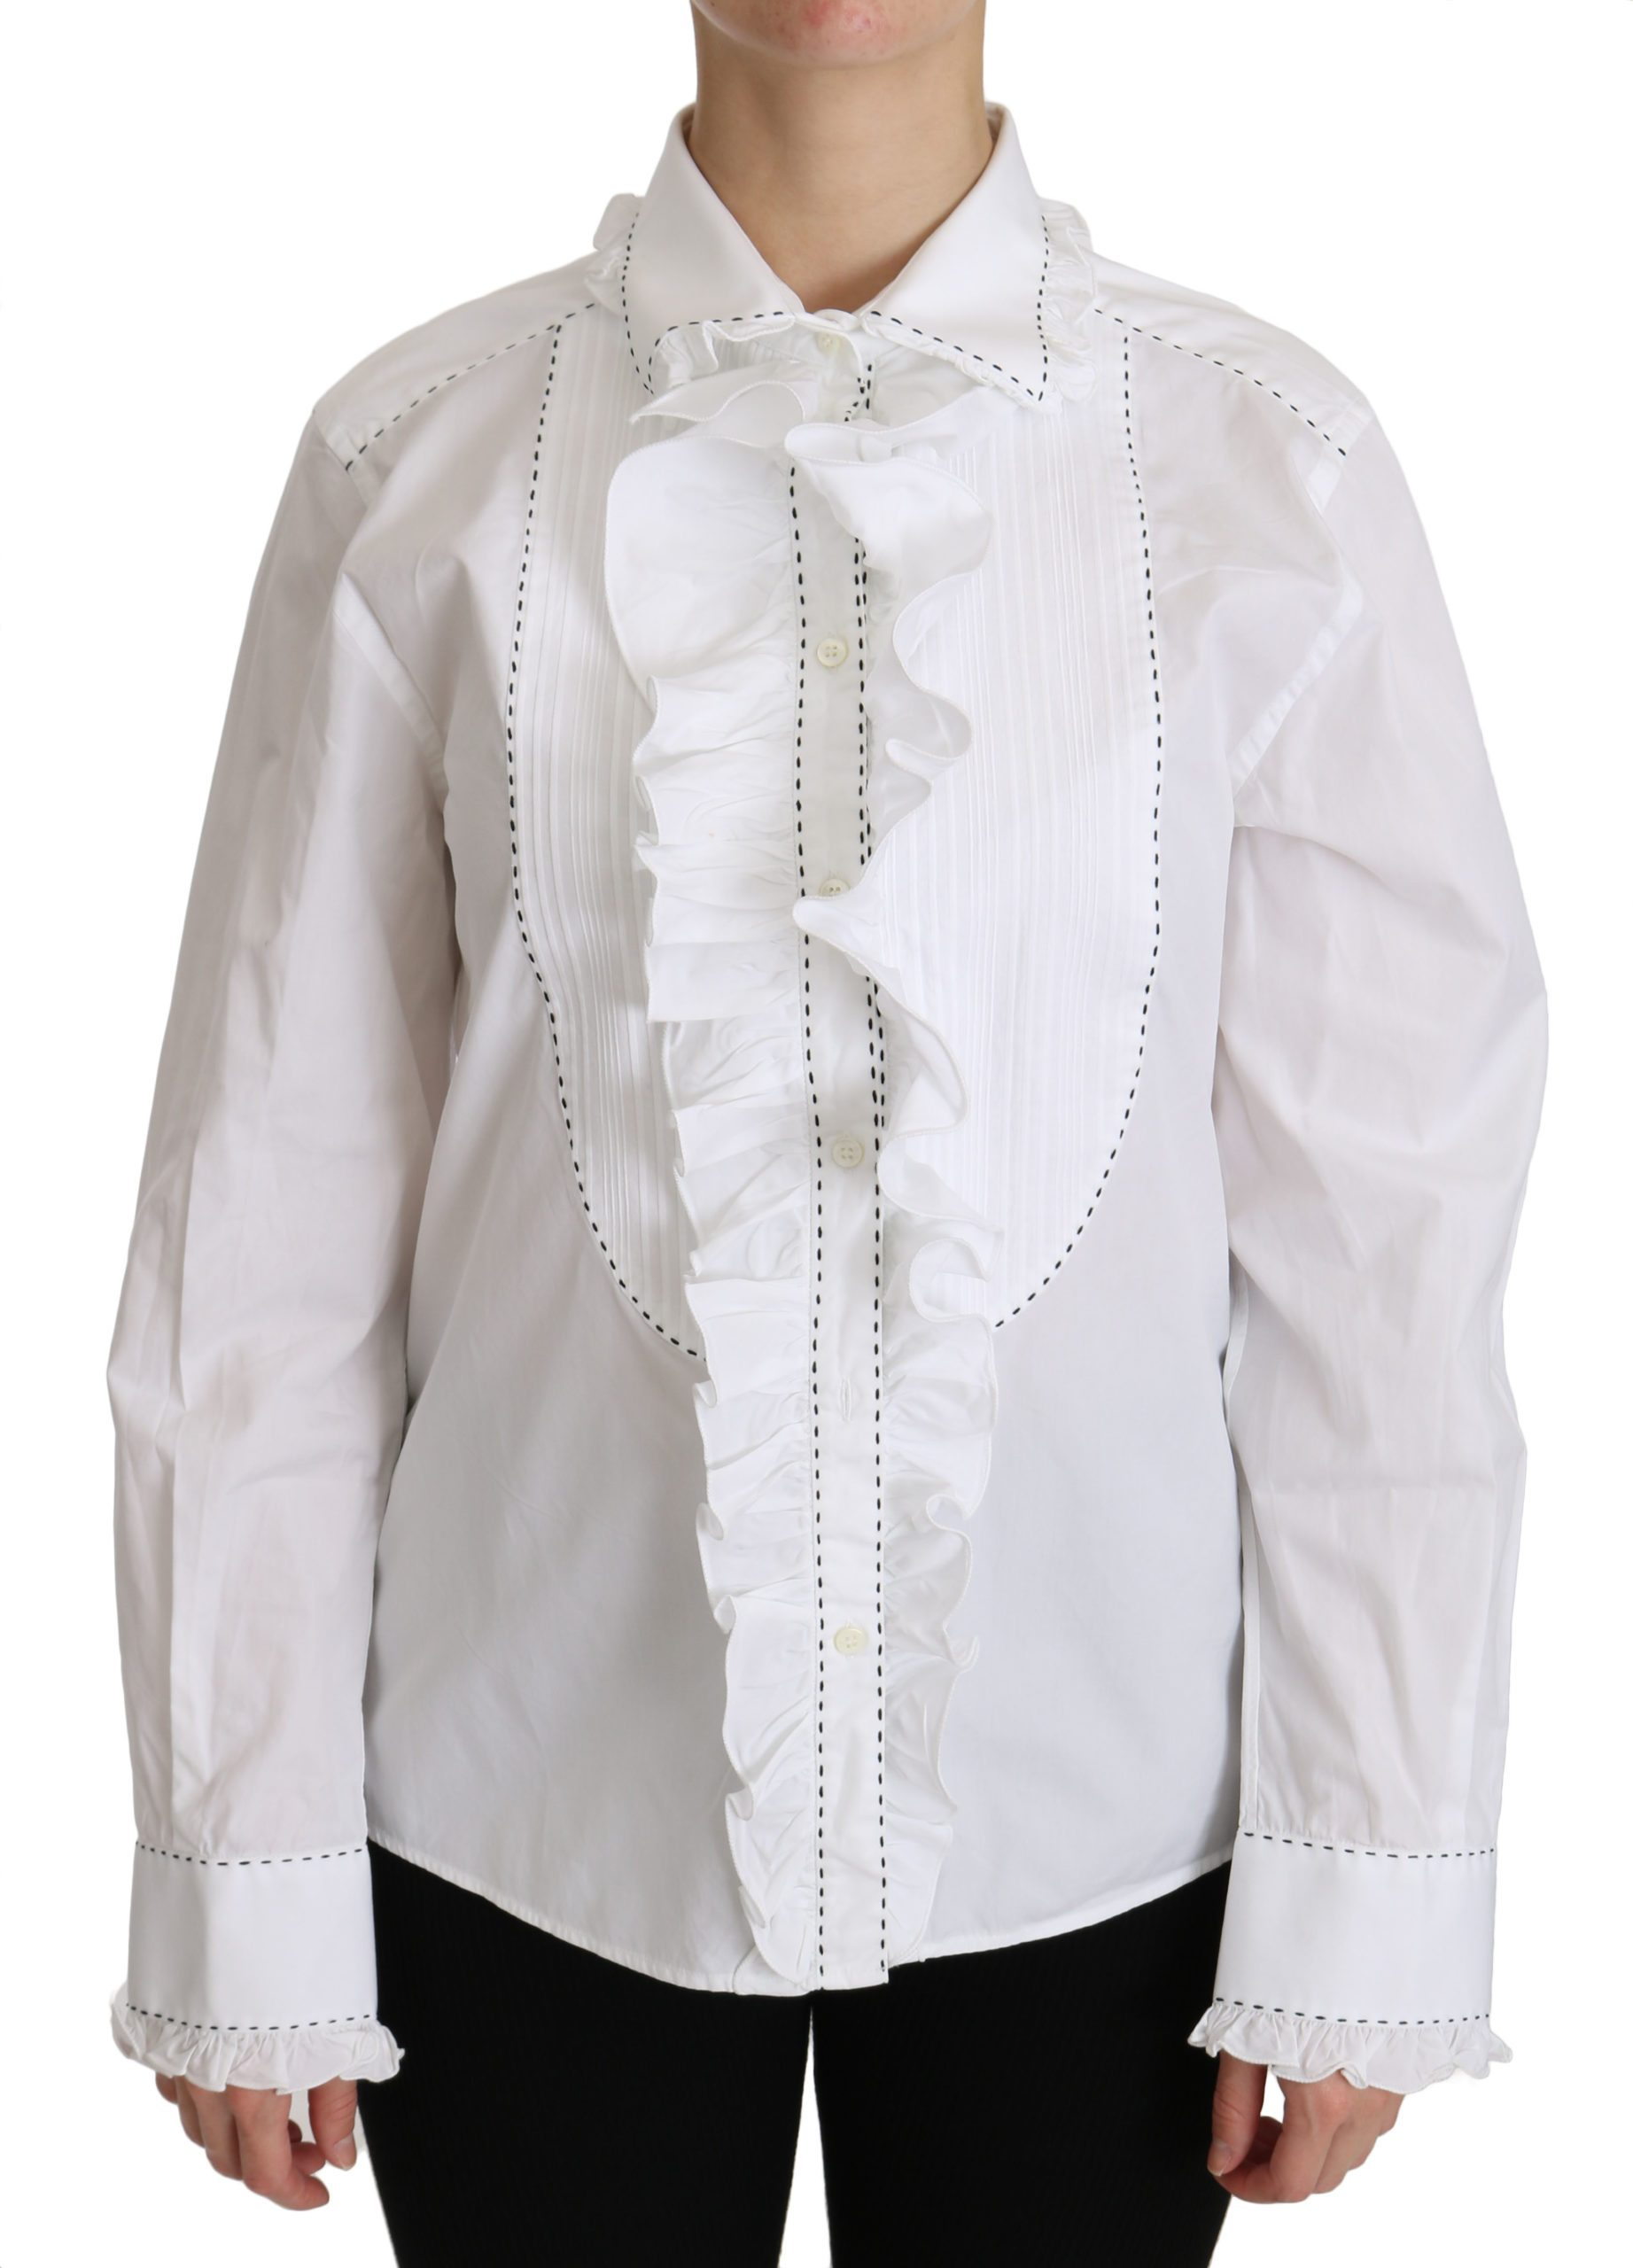 Dolce & Gabbana Women's Ruffle Collared Cotton Shirt White TSH4313 - IT42|M